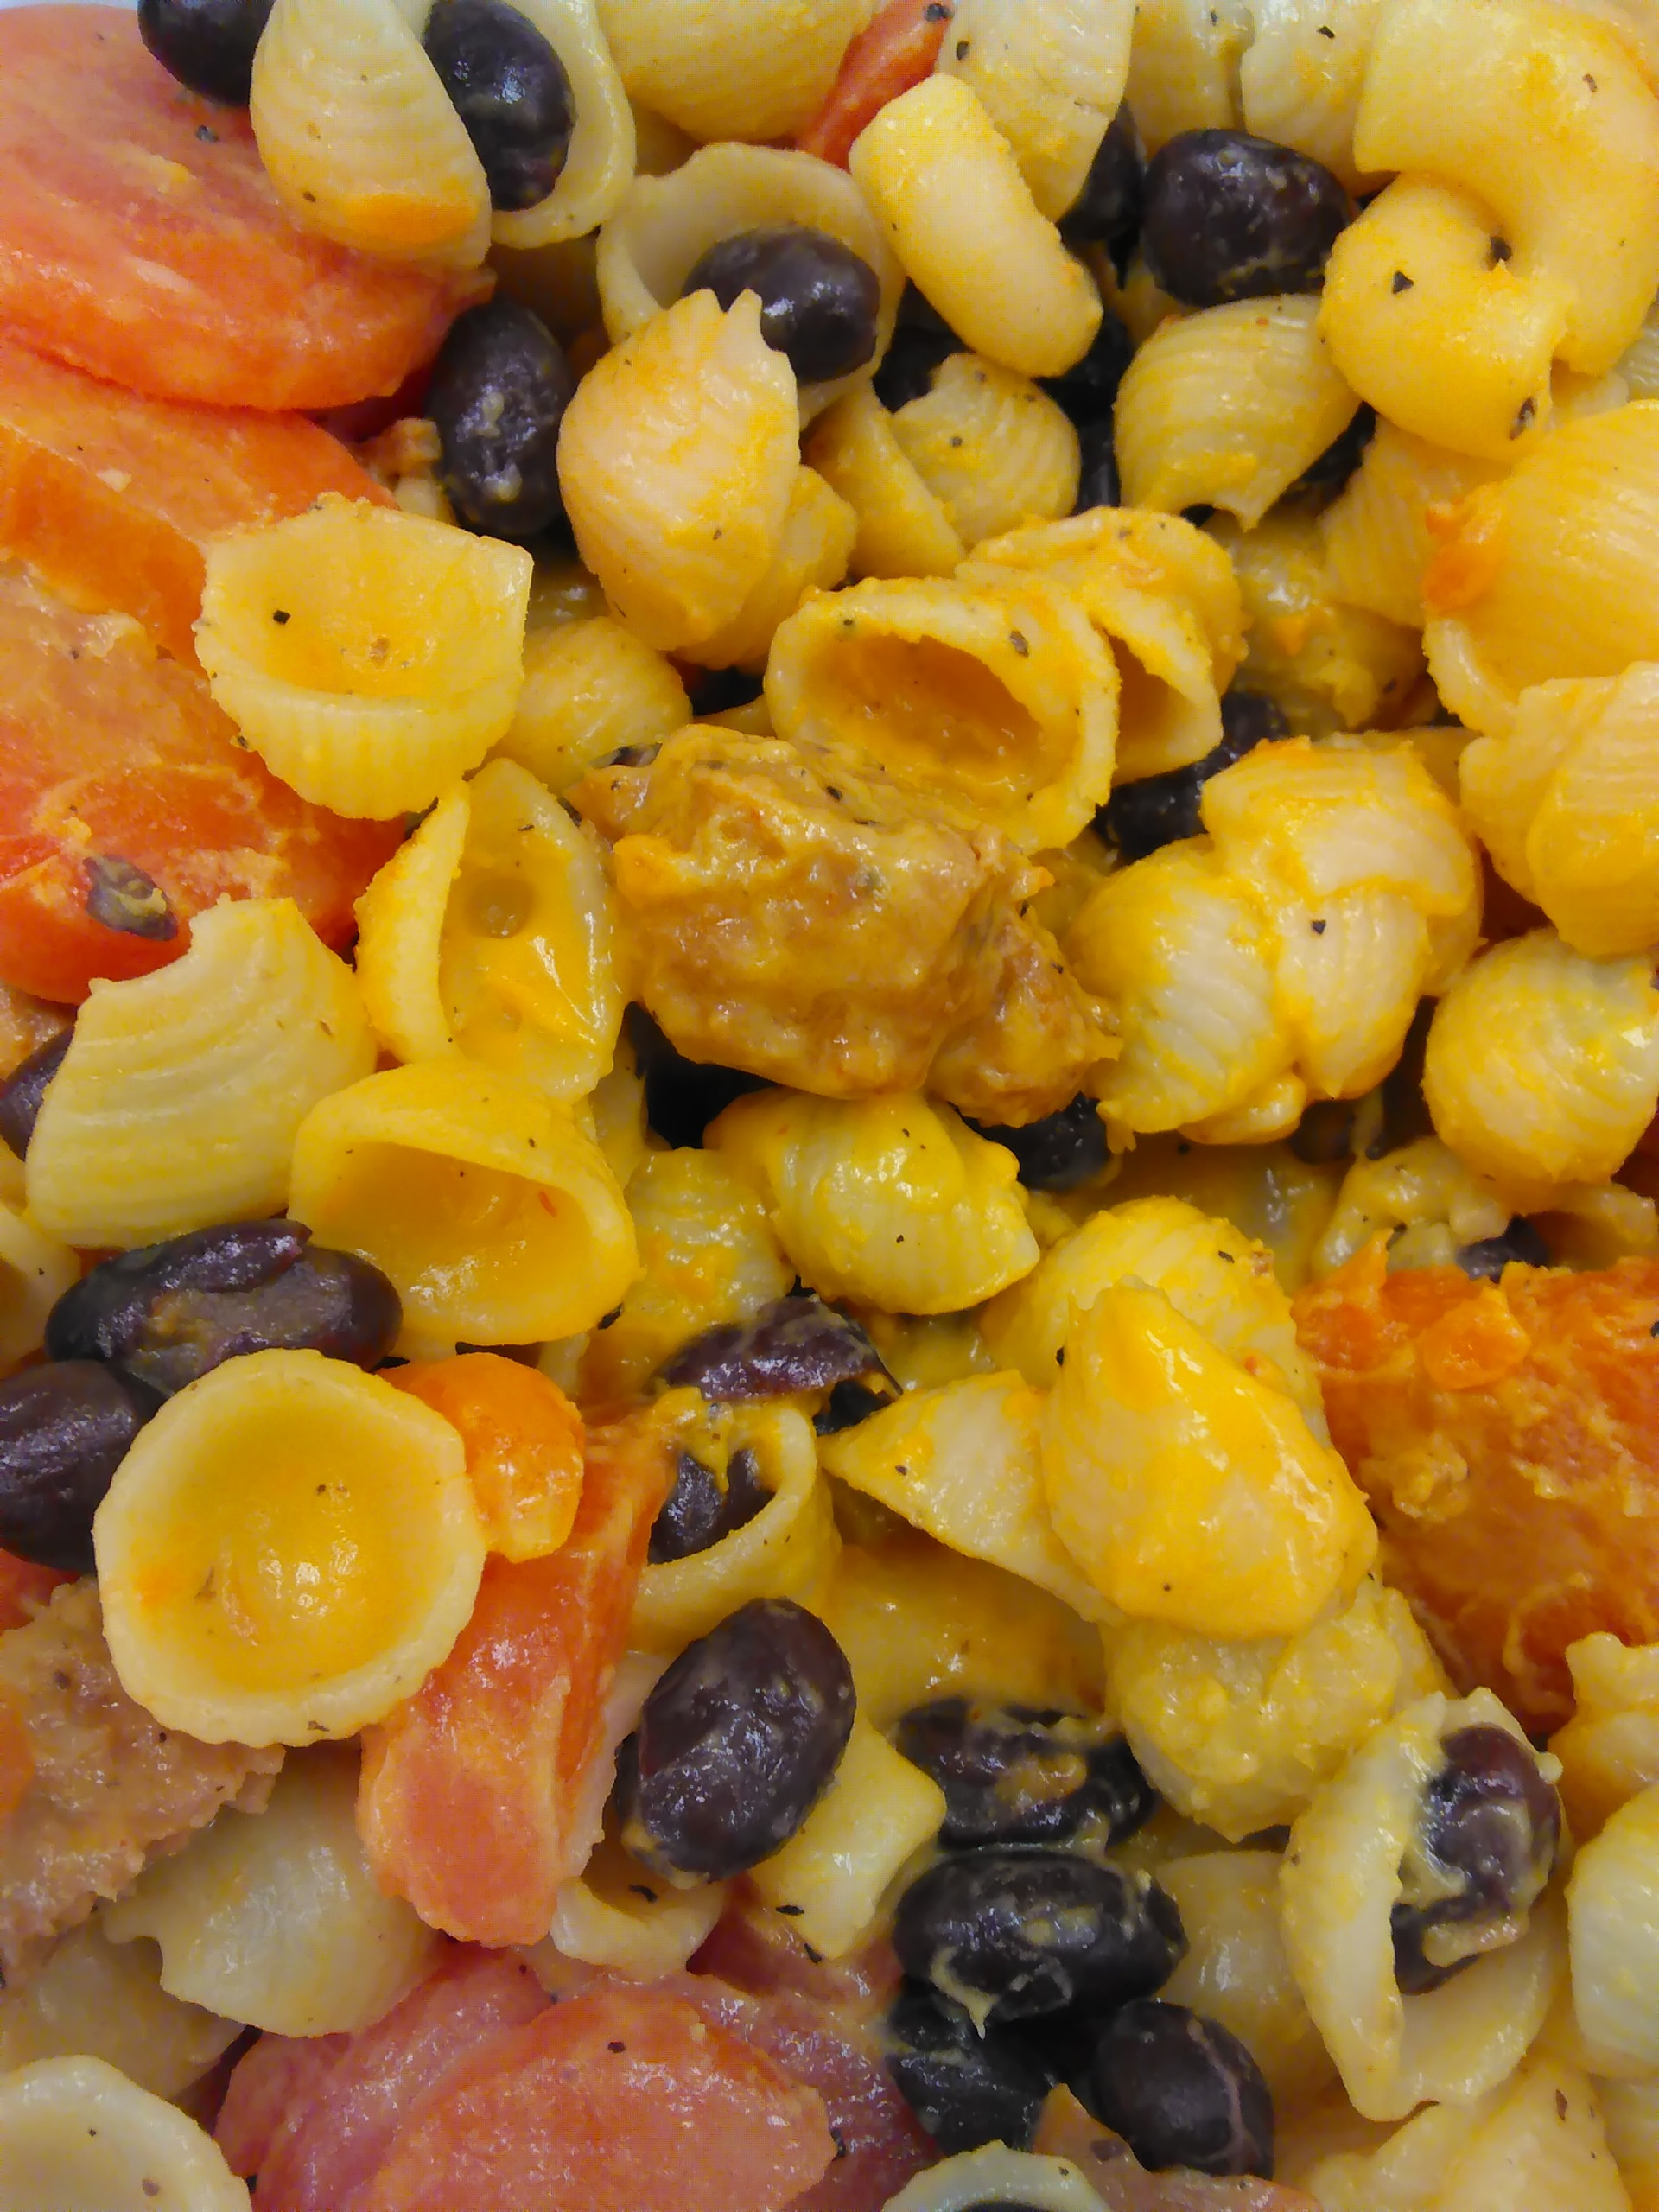 Leftovers | codenamesailorearth, cooking, cuisine, delicious